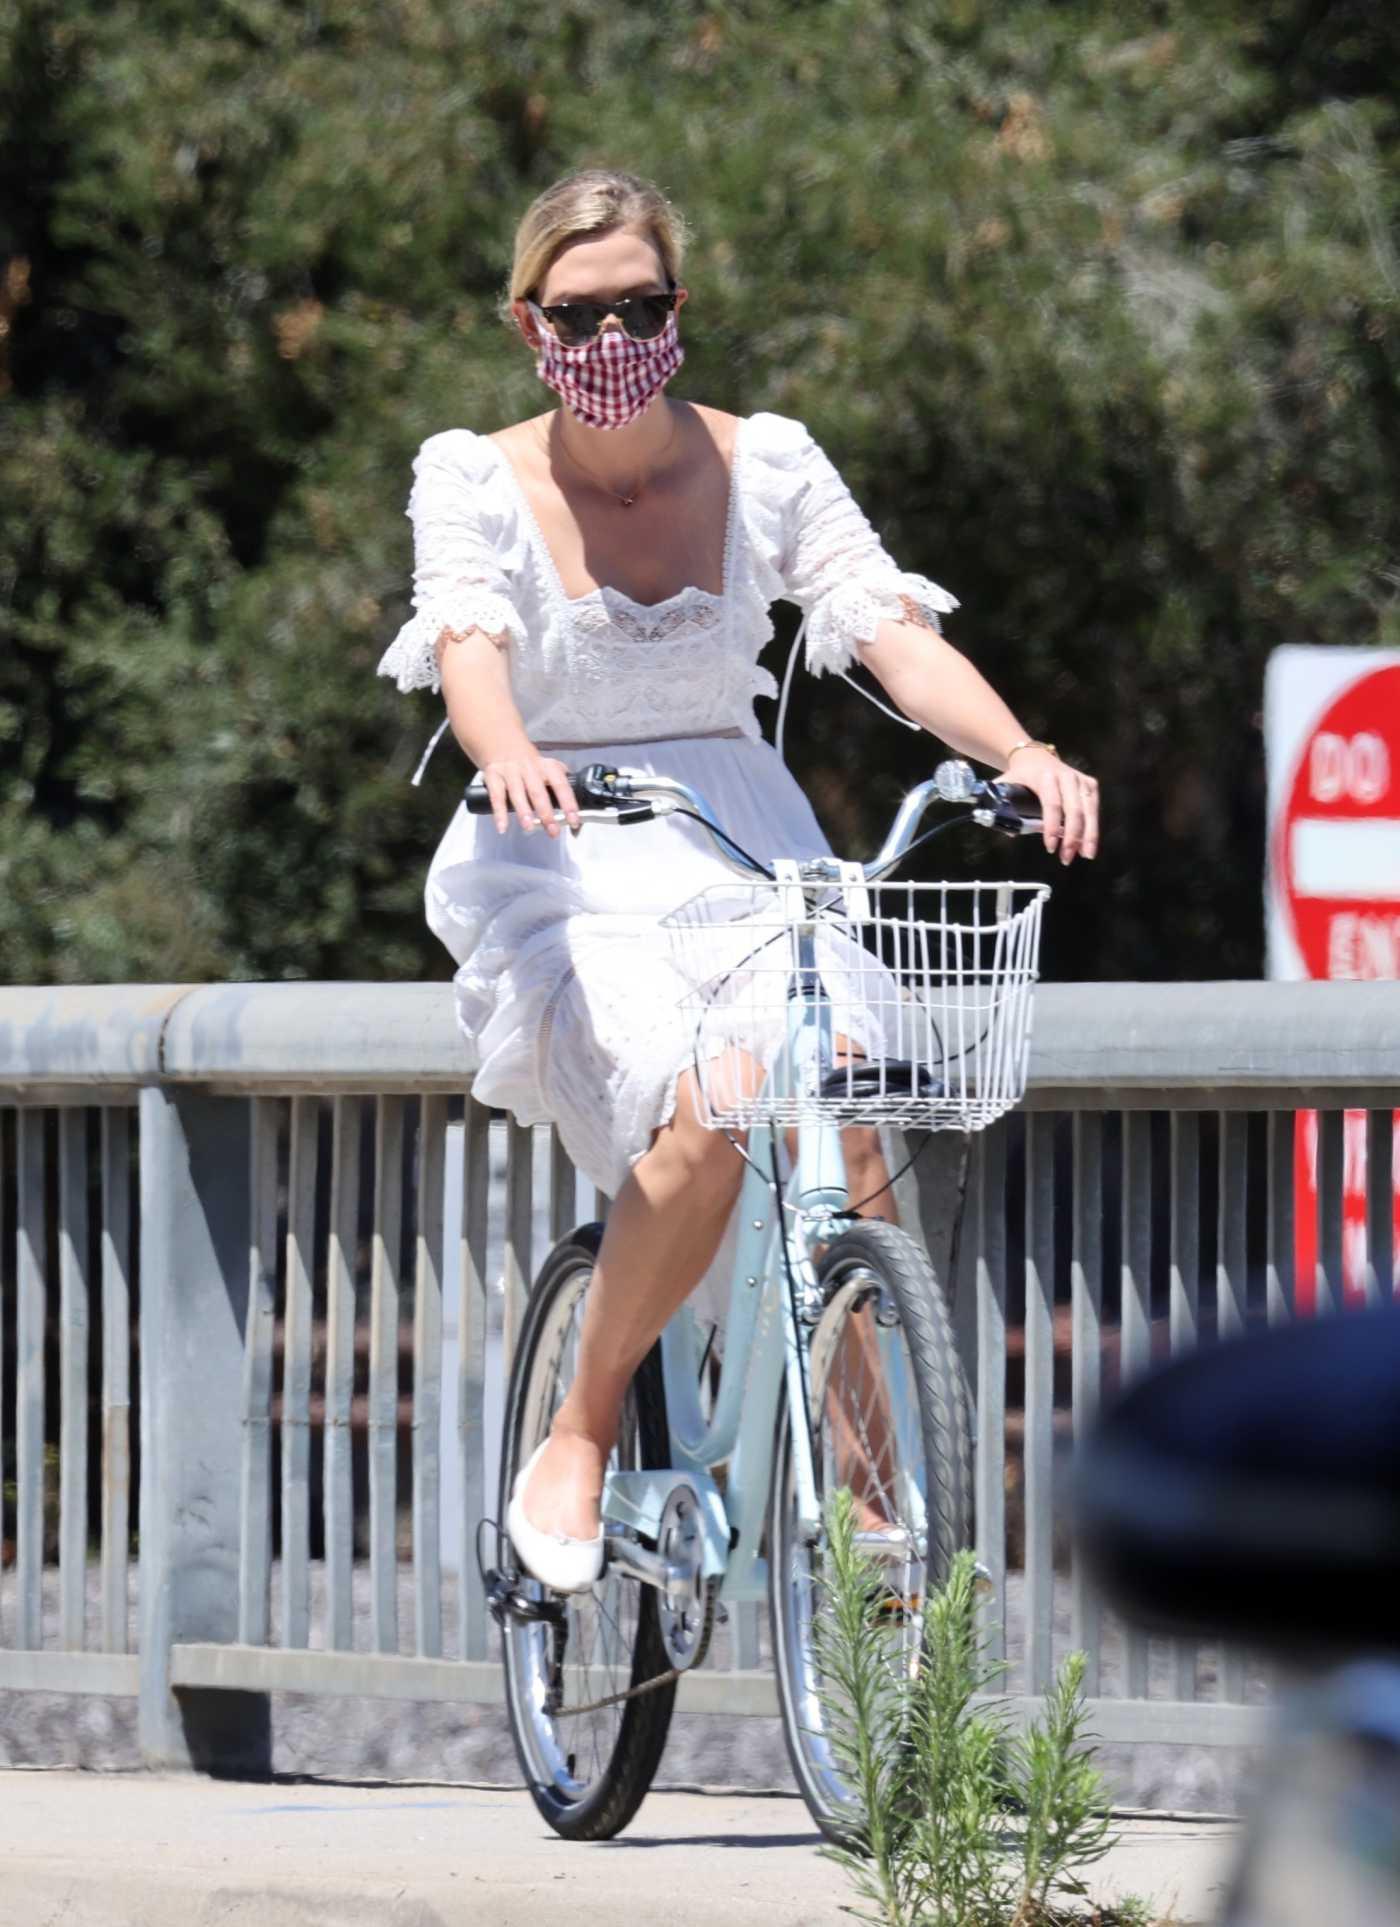 Karlie Kloss in a White Dress Does a Bike Ride in Santa Monica 07/18/2020